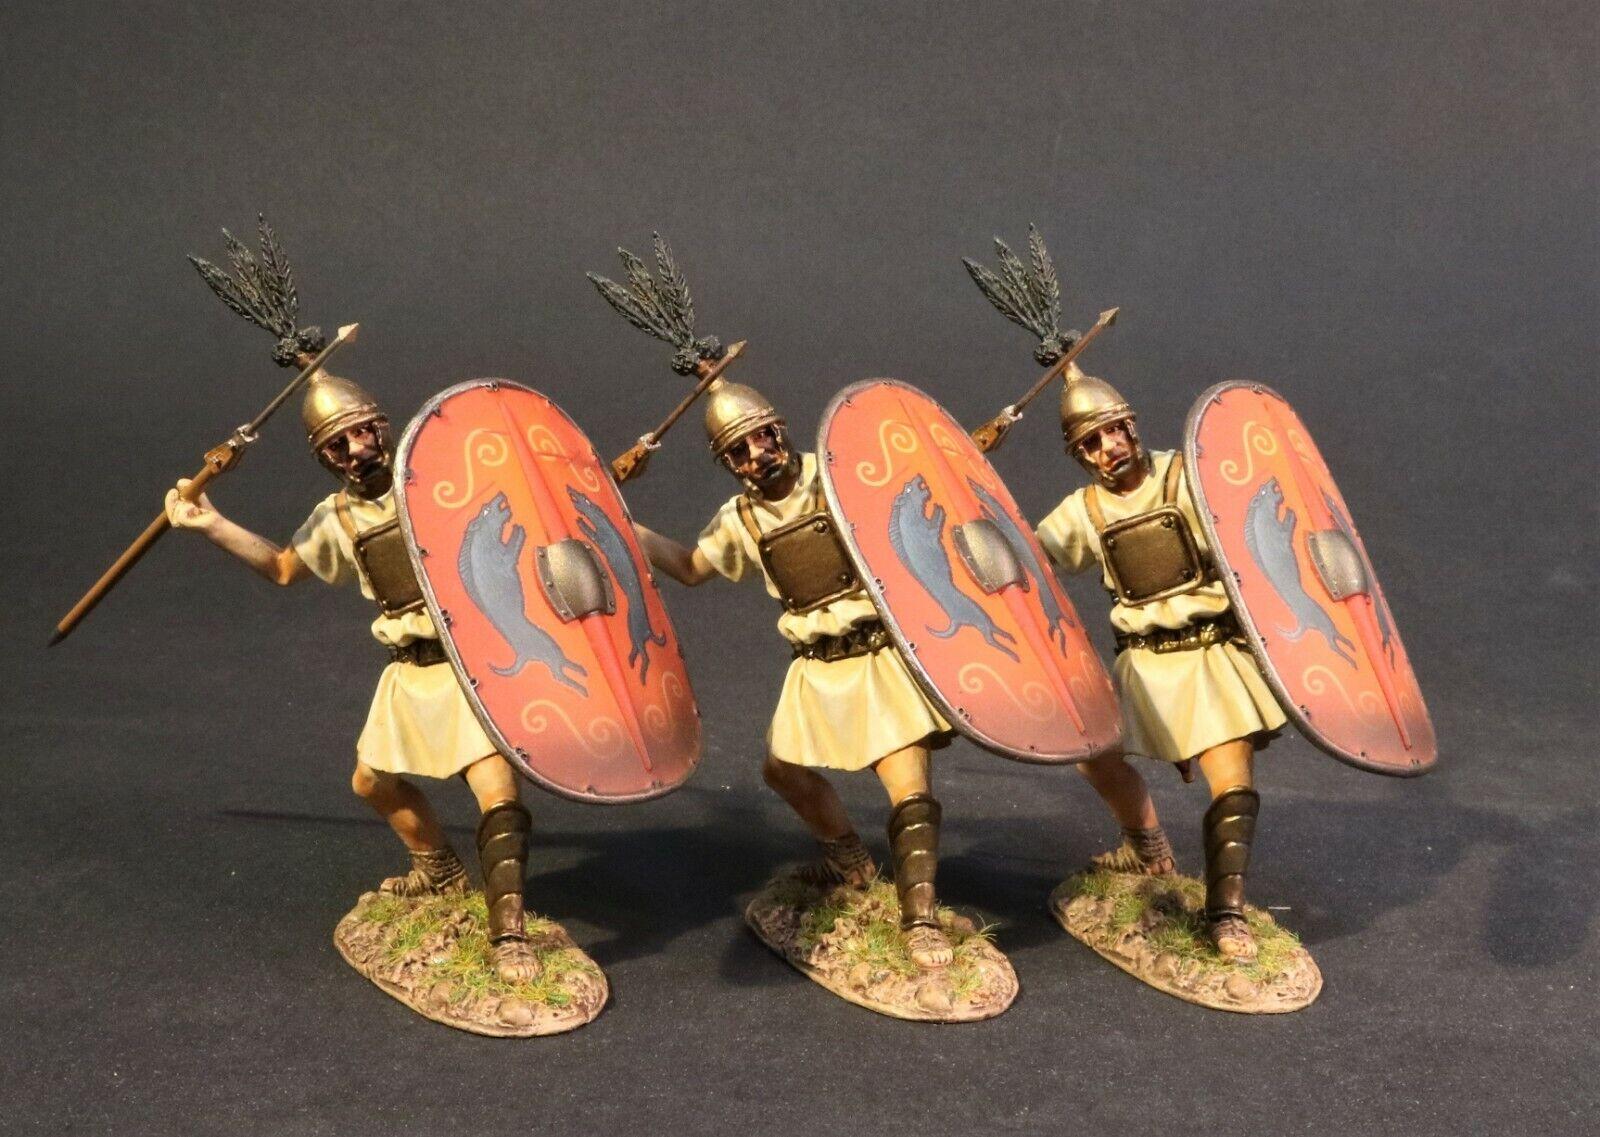 John Jenkins Roman Empire Age Of Arthur HMRR-16RN Drei Hastatus Wurf Pilums